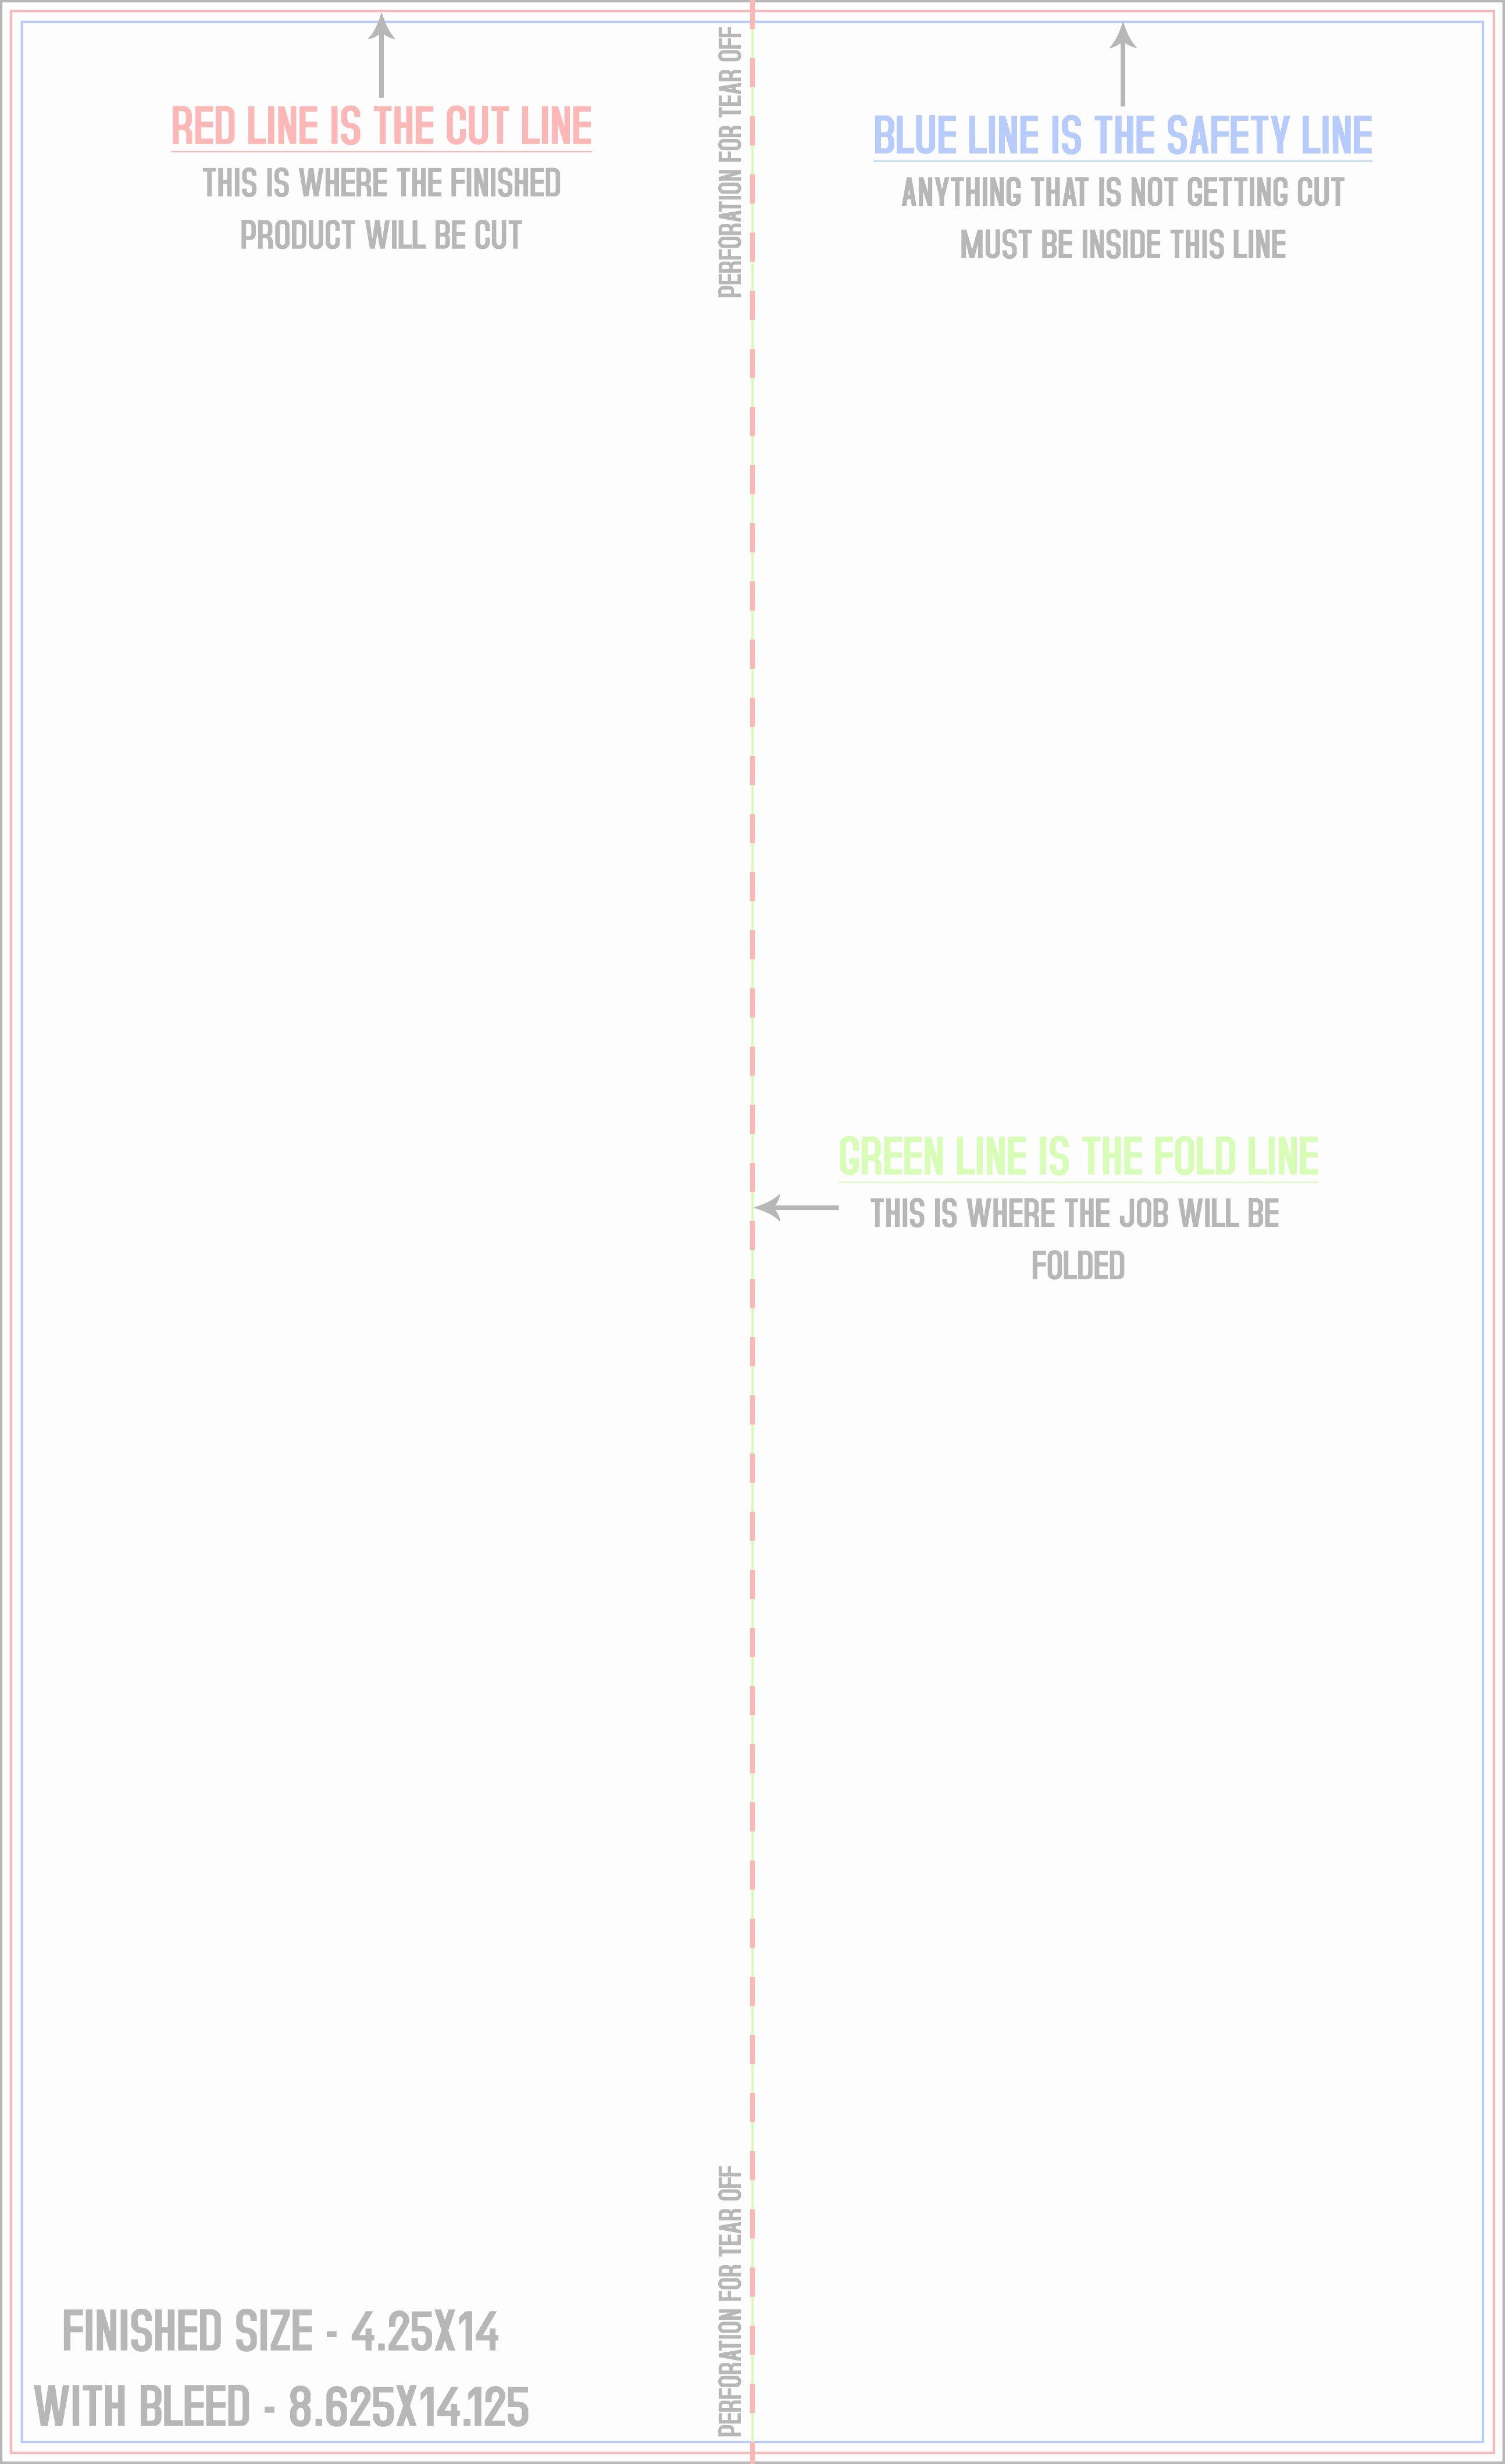 Half Fold Brochure Template Free Elegant Brochure Half Fold & Perf On Fold Templates